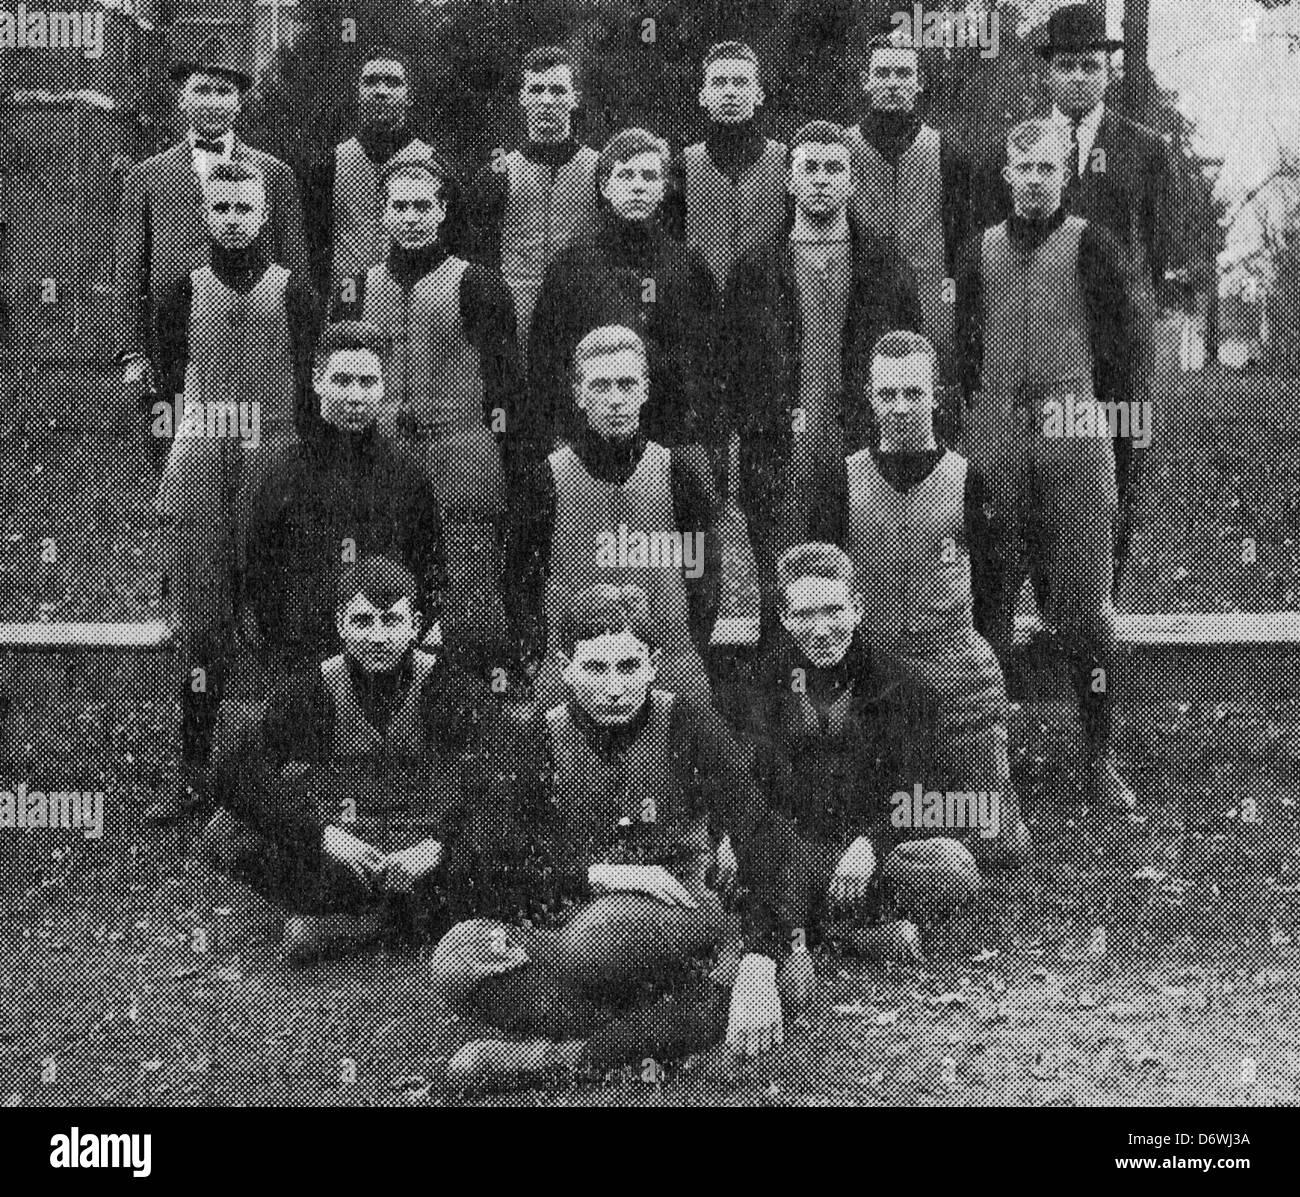 Ohio's Champion High School Football Team - The Fostoria eleven, 1912 - Stock Image